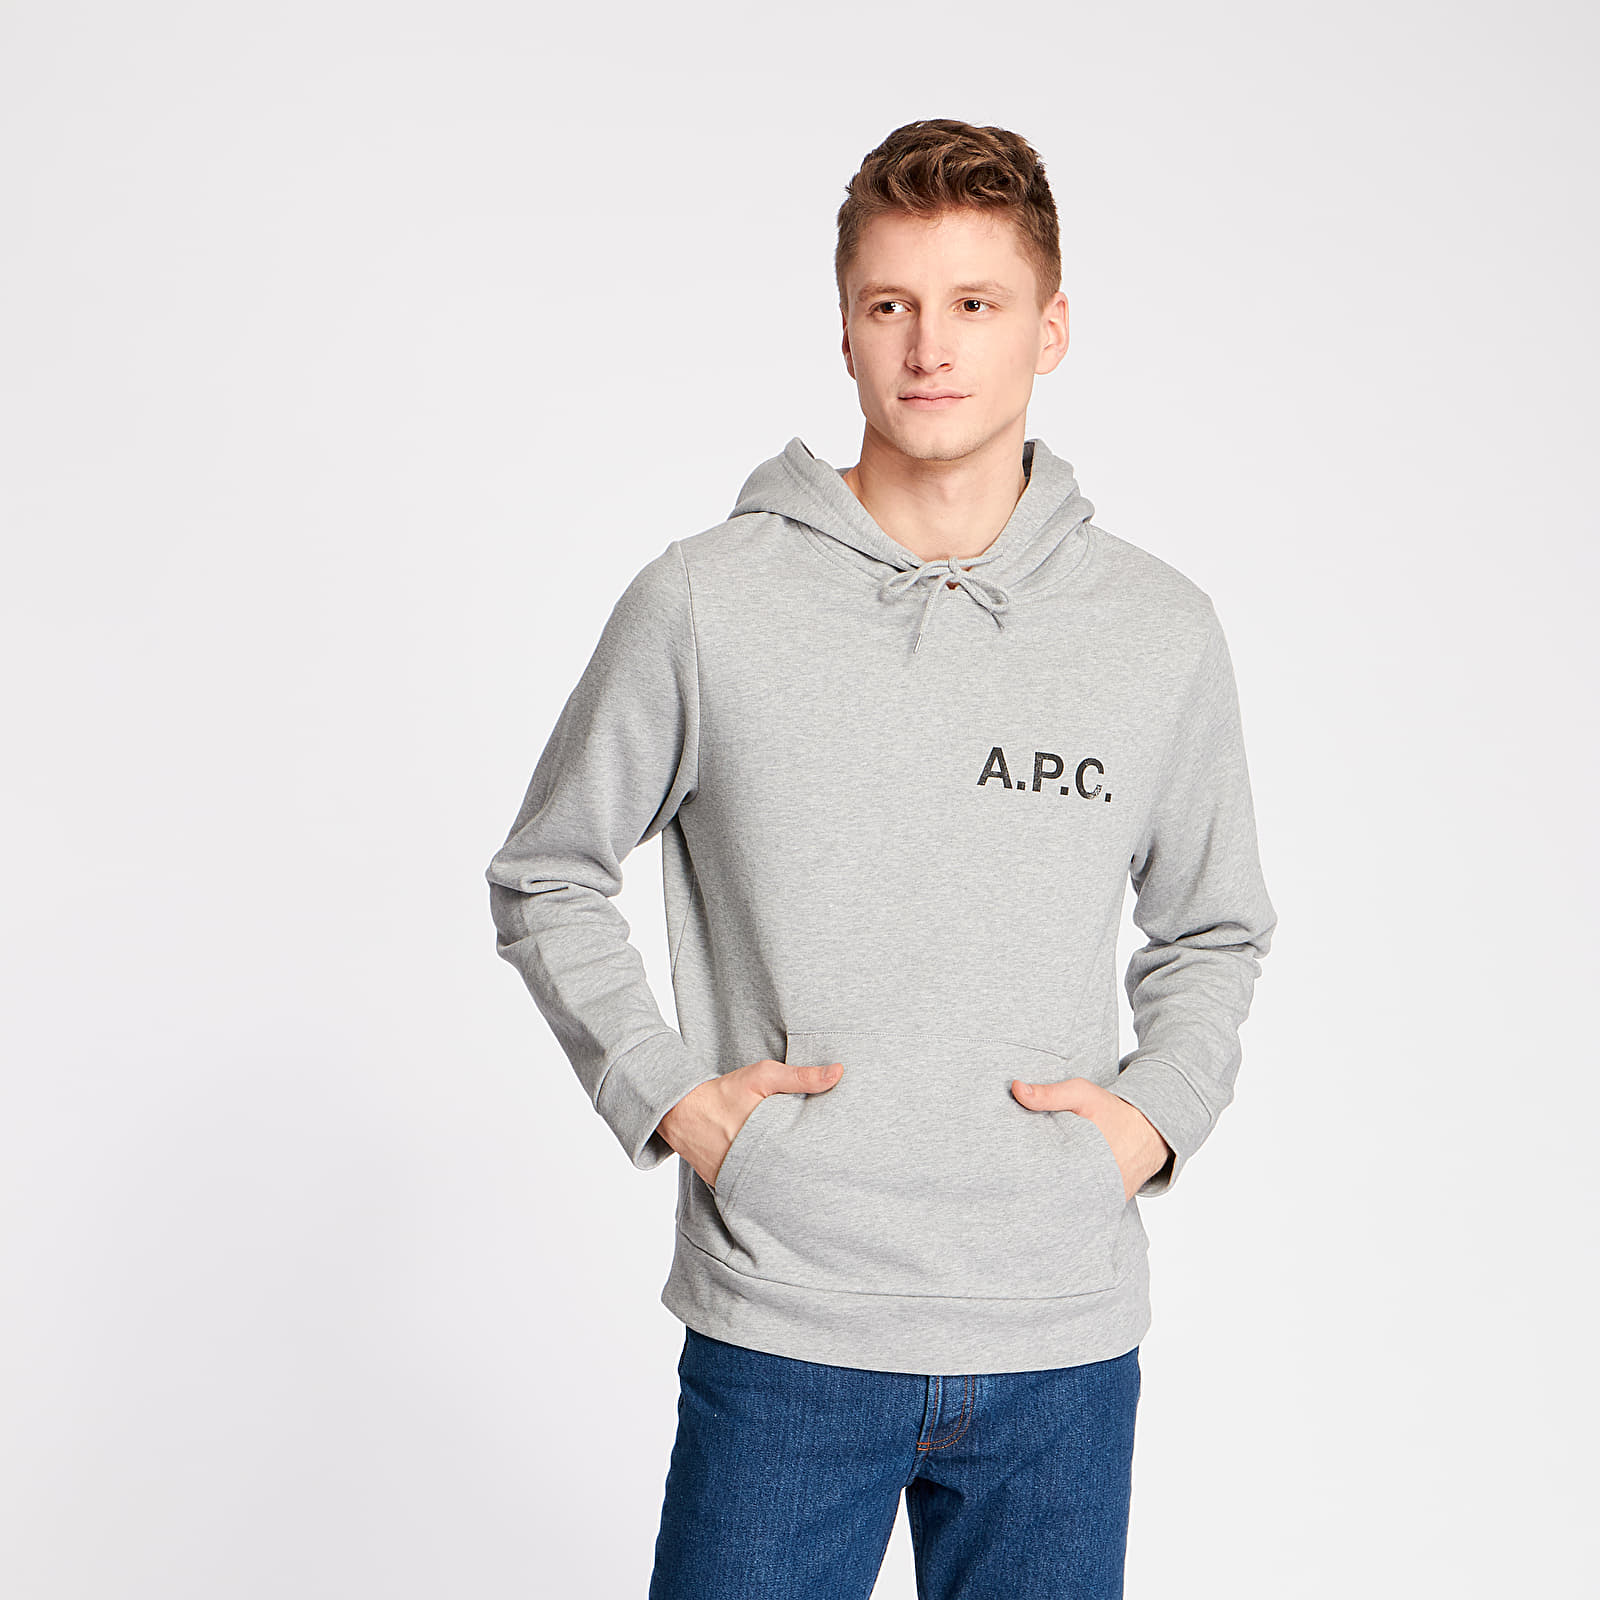 Sweatshirts A.P.C. Stamp Hoodie Gris Chine